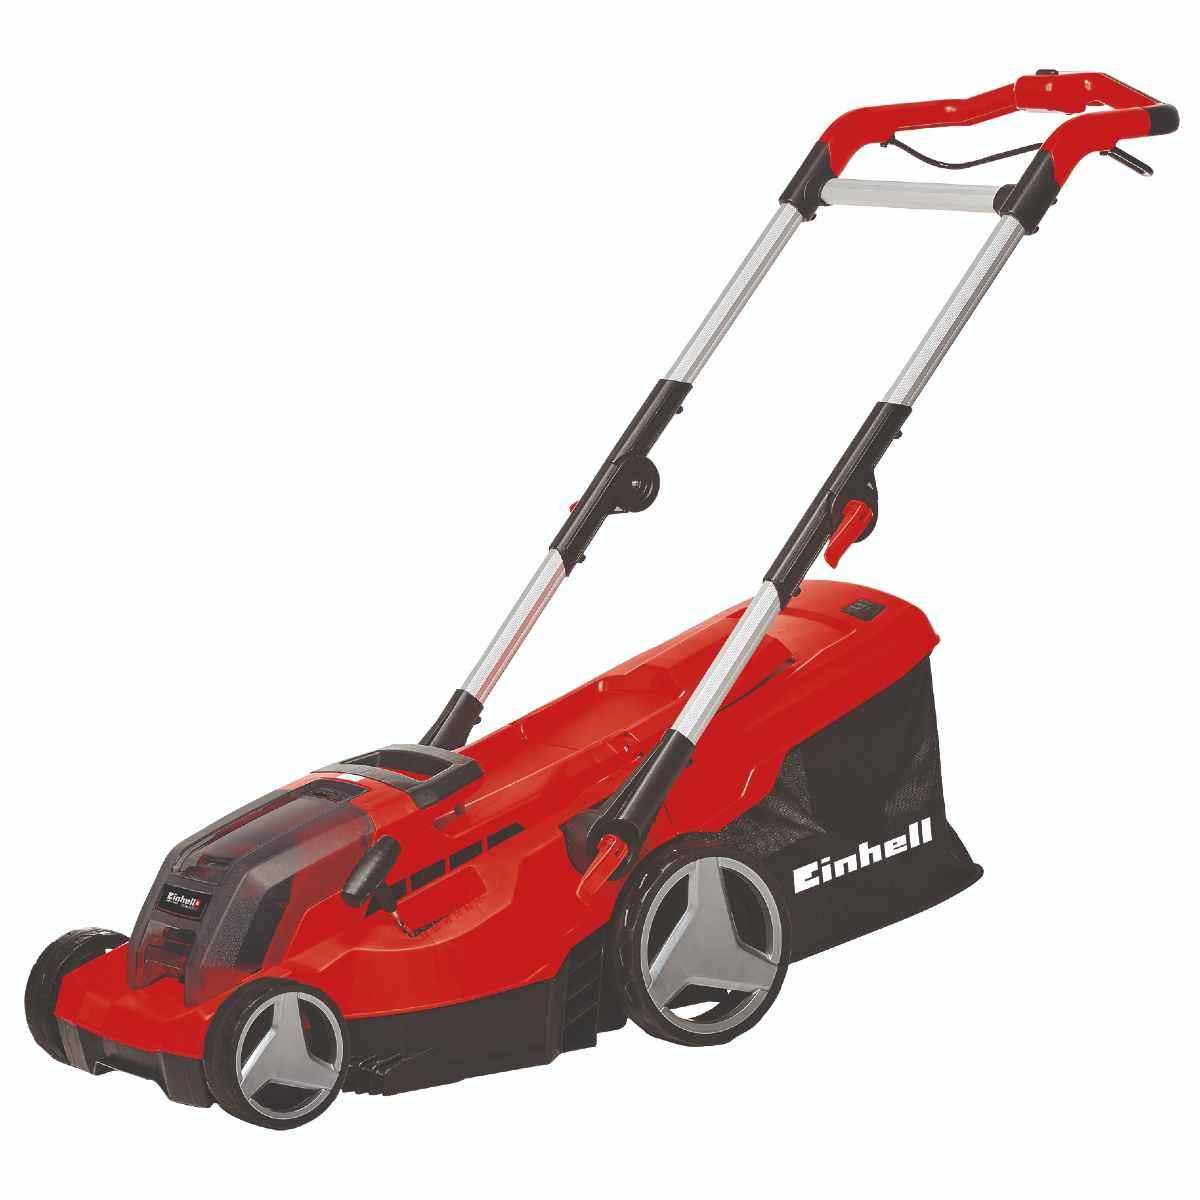 Einhell 36v Cordless 37cm Lawn Mower